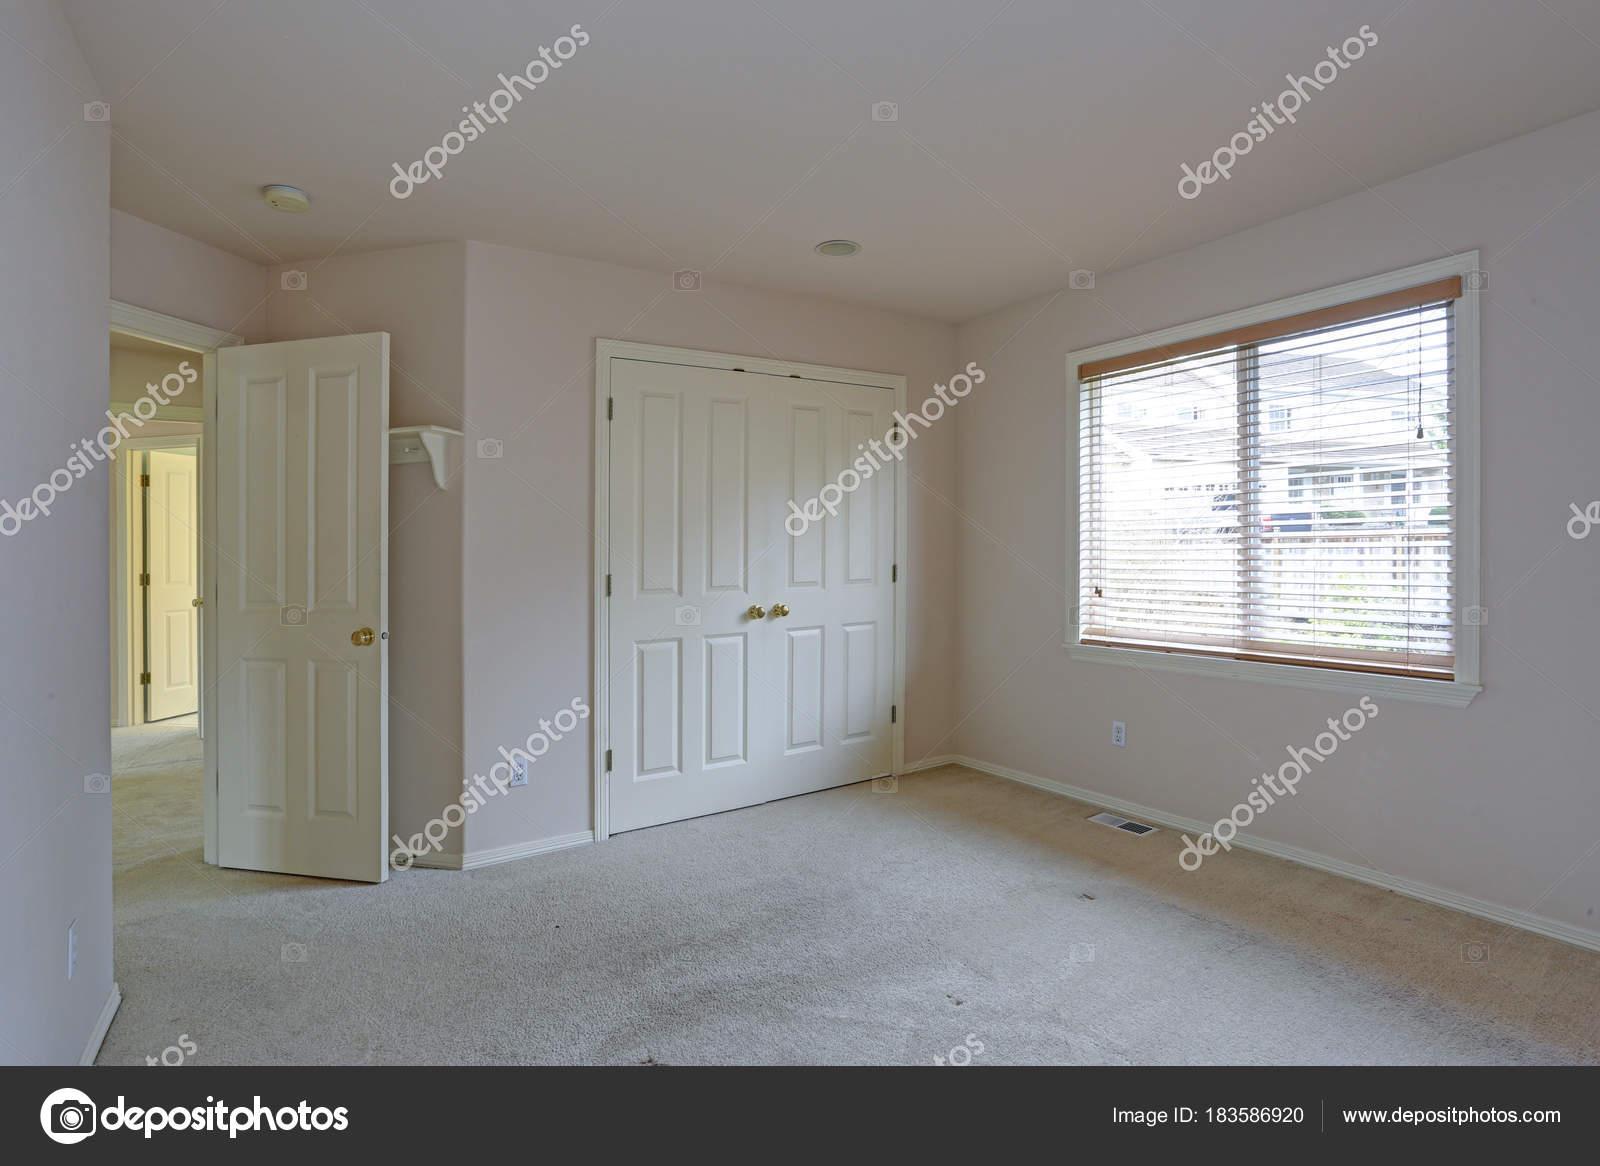 Leere Schlafzimmer Mit Creme Farbe Farbe Wande Stockfoto C Alabn